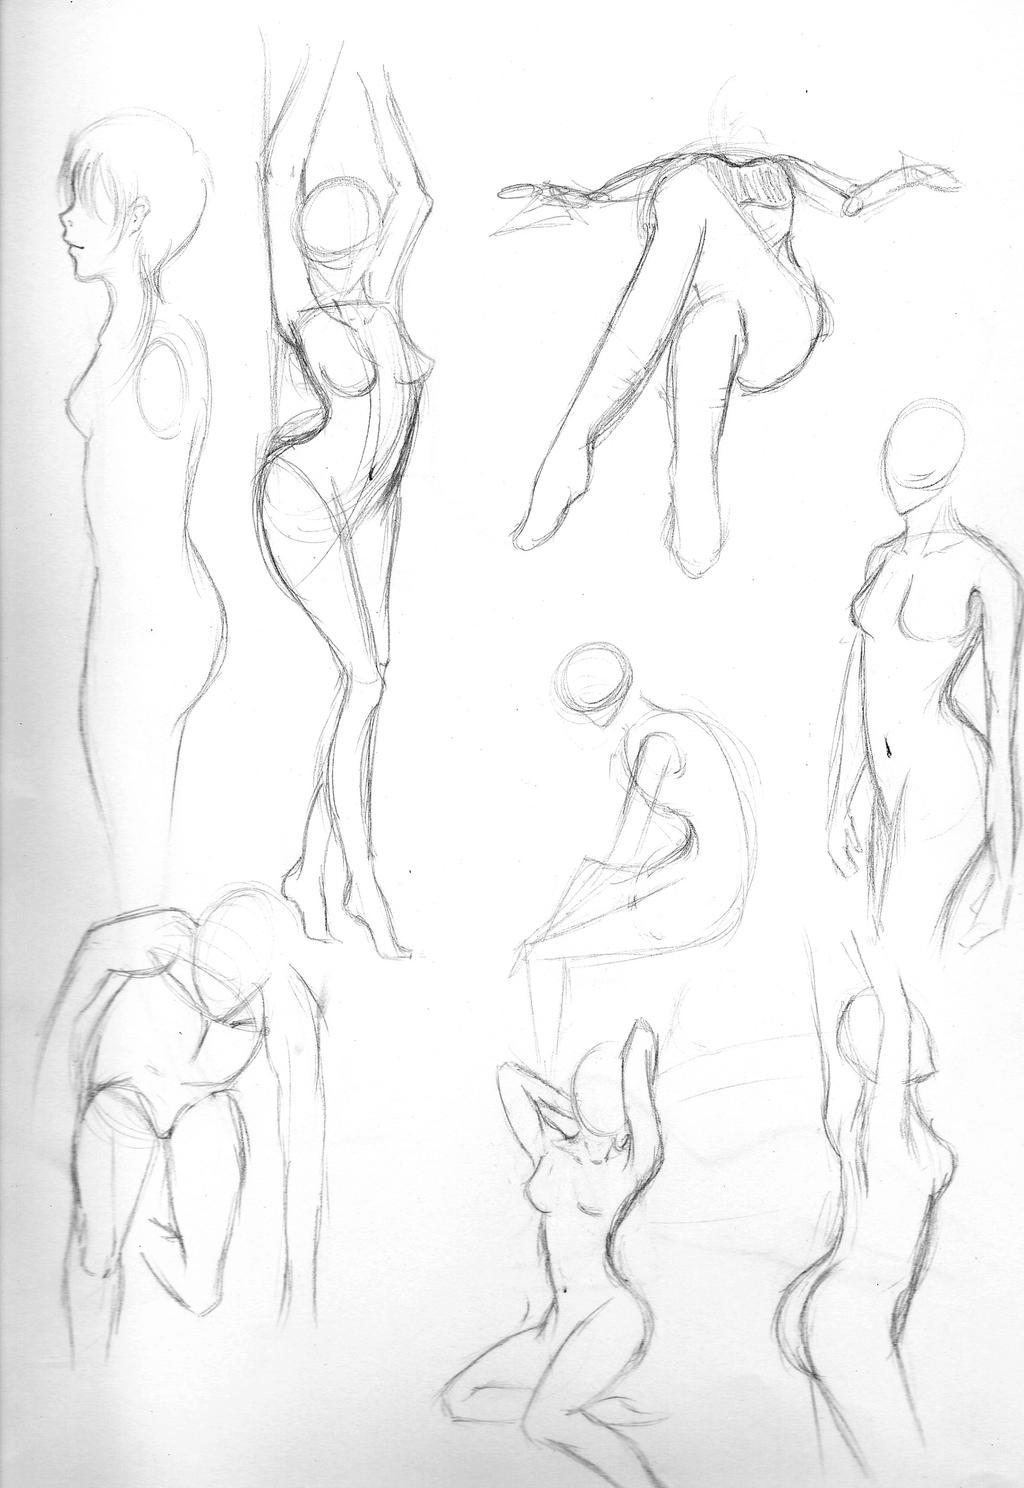 Anatomy Practice Drawing Gallery - human body anatomy